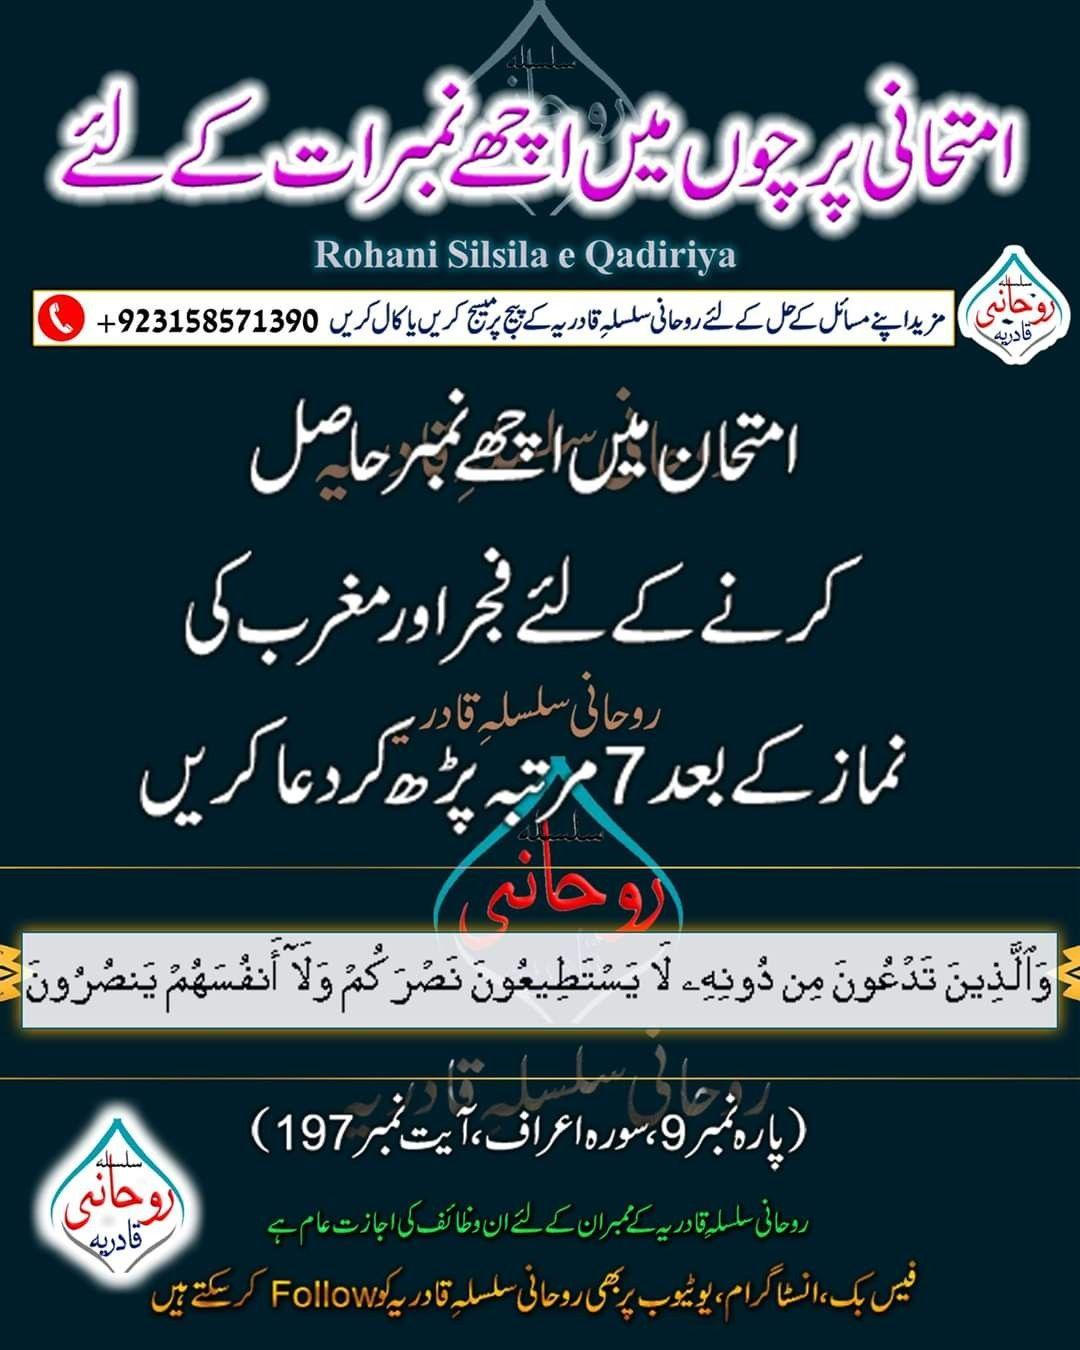 Imtihan Mein Kamyabi Ka Wazifa امتحان میں اچھے نمبر لینے کے لئے دعا Rohanisilsilaeqadi Islamic Phrases Islamic Inspirational Quotes Quran Quotes Inspirational